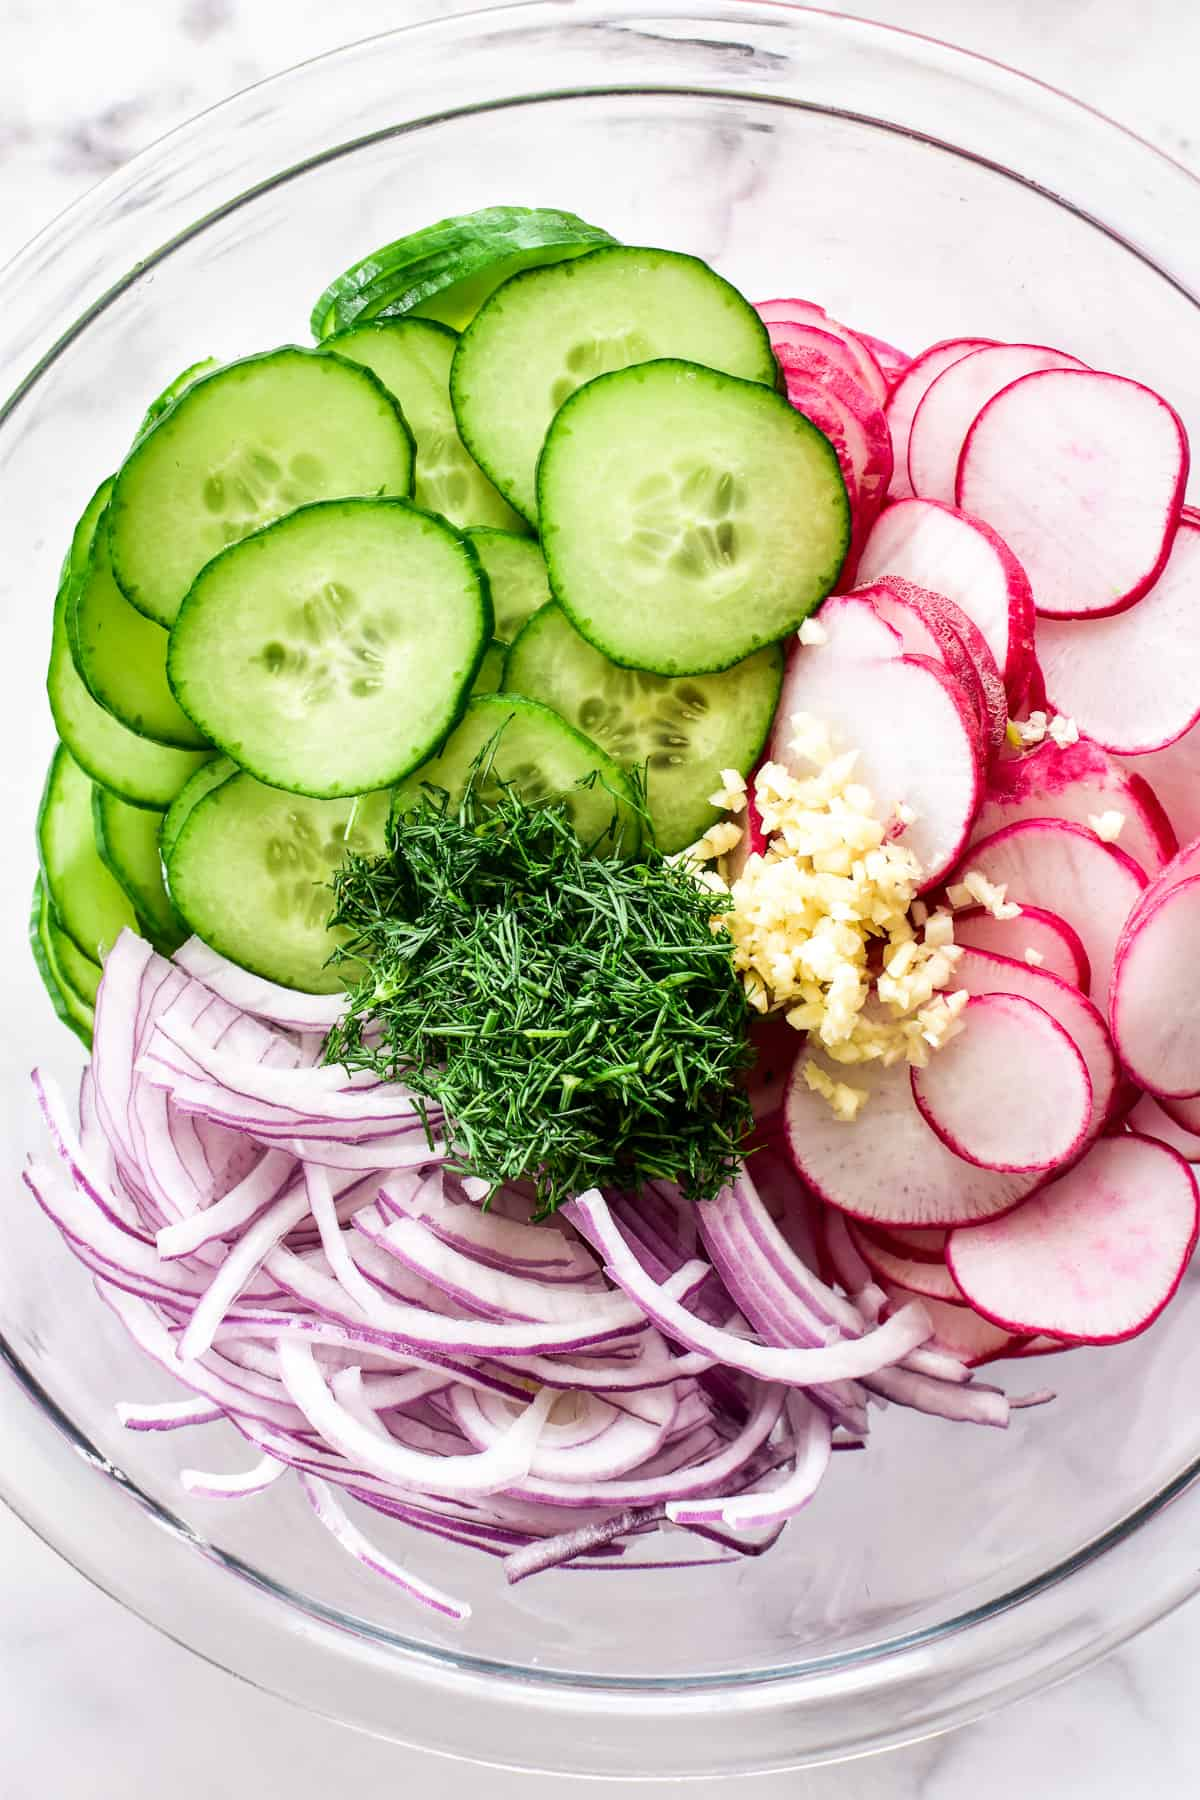 Radish Salad ingredients in a mixing bowl